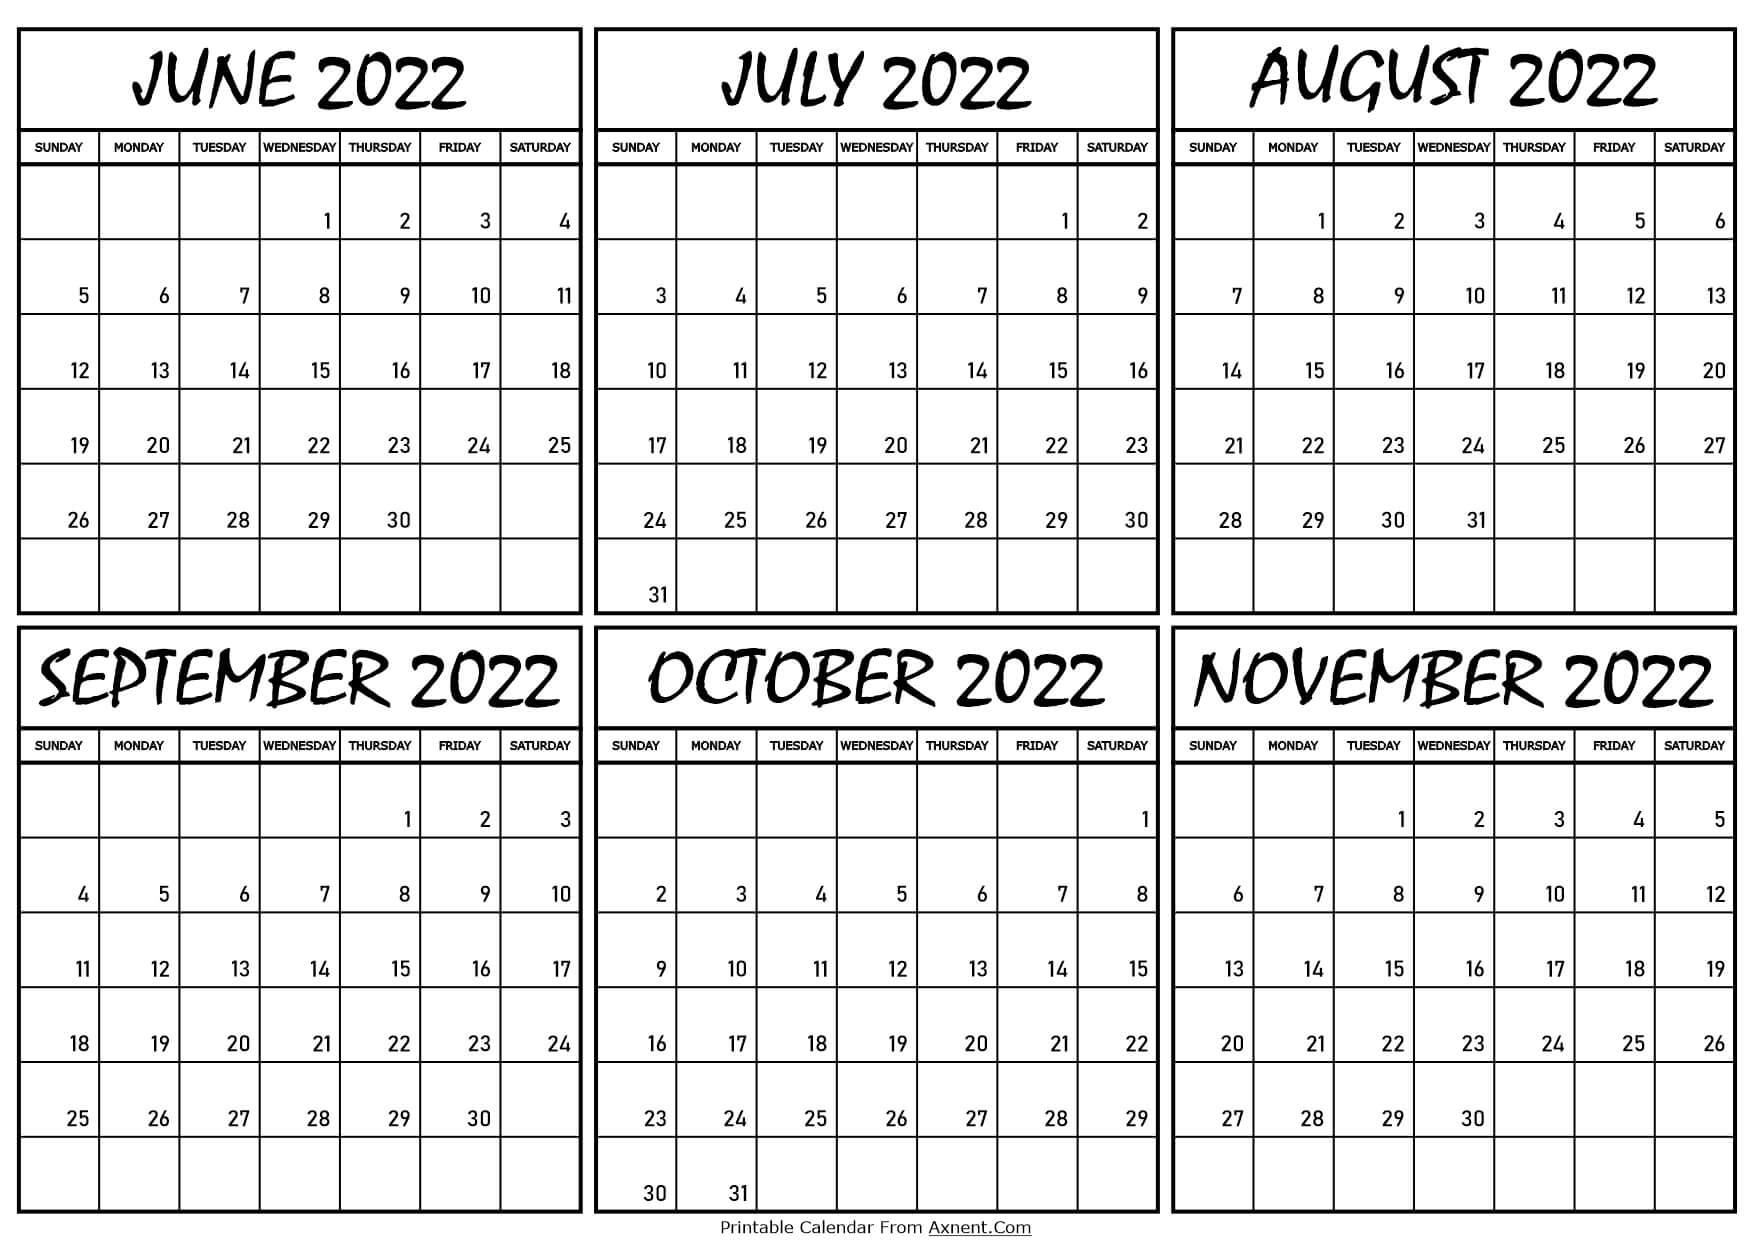 Calendar June to November 2022